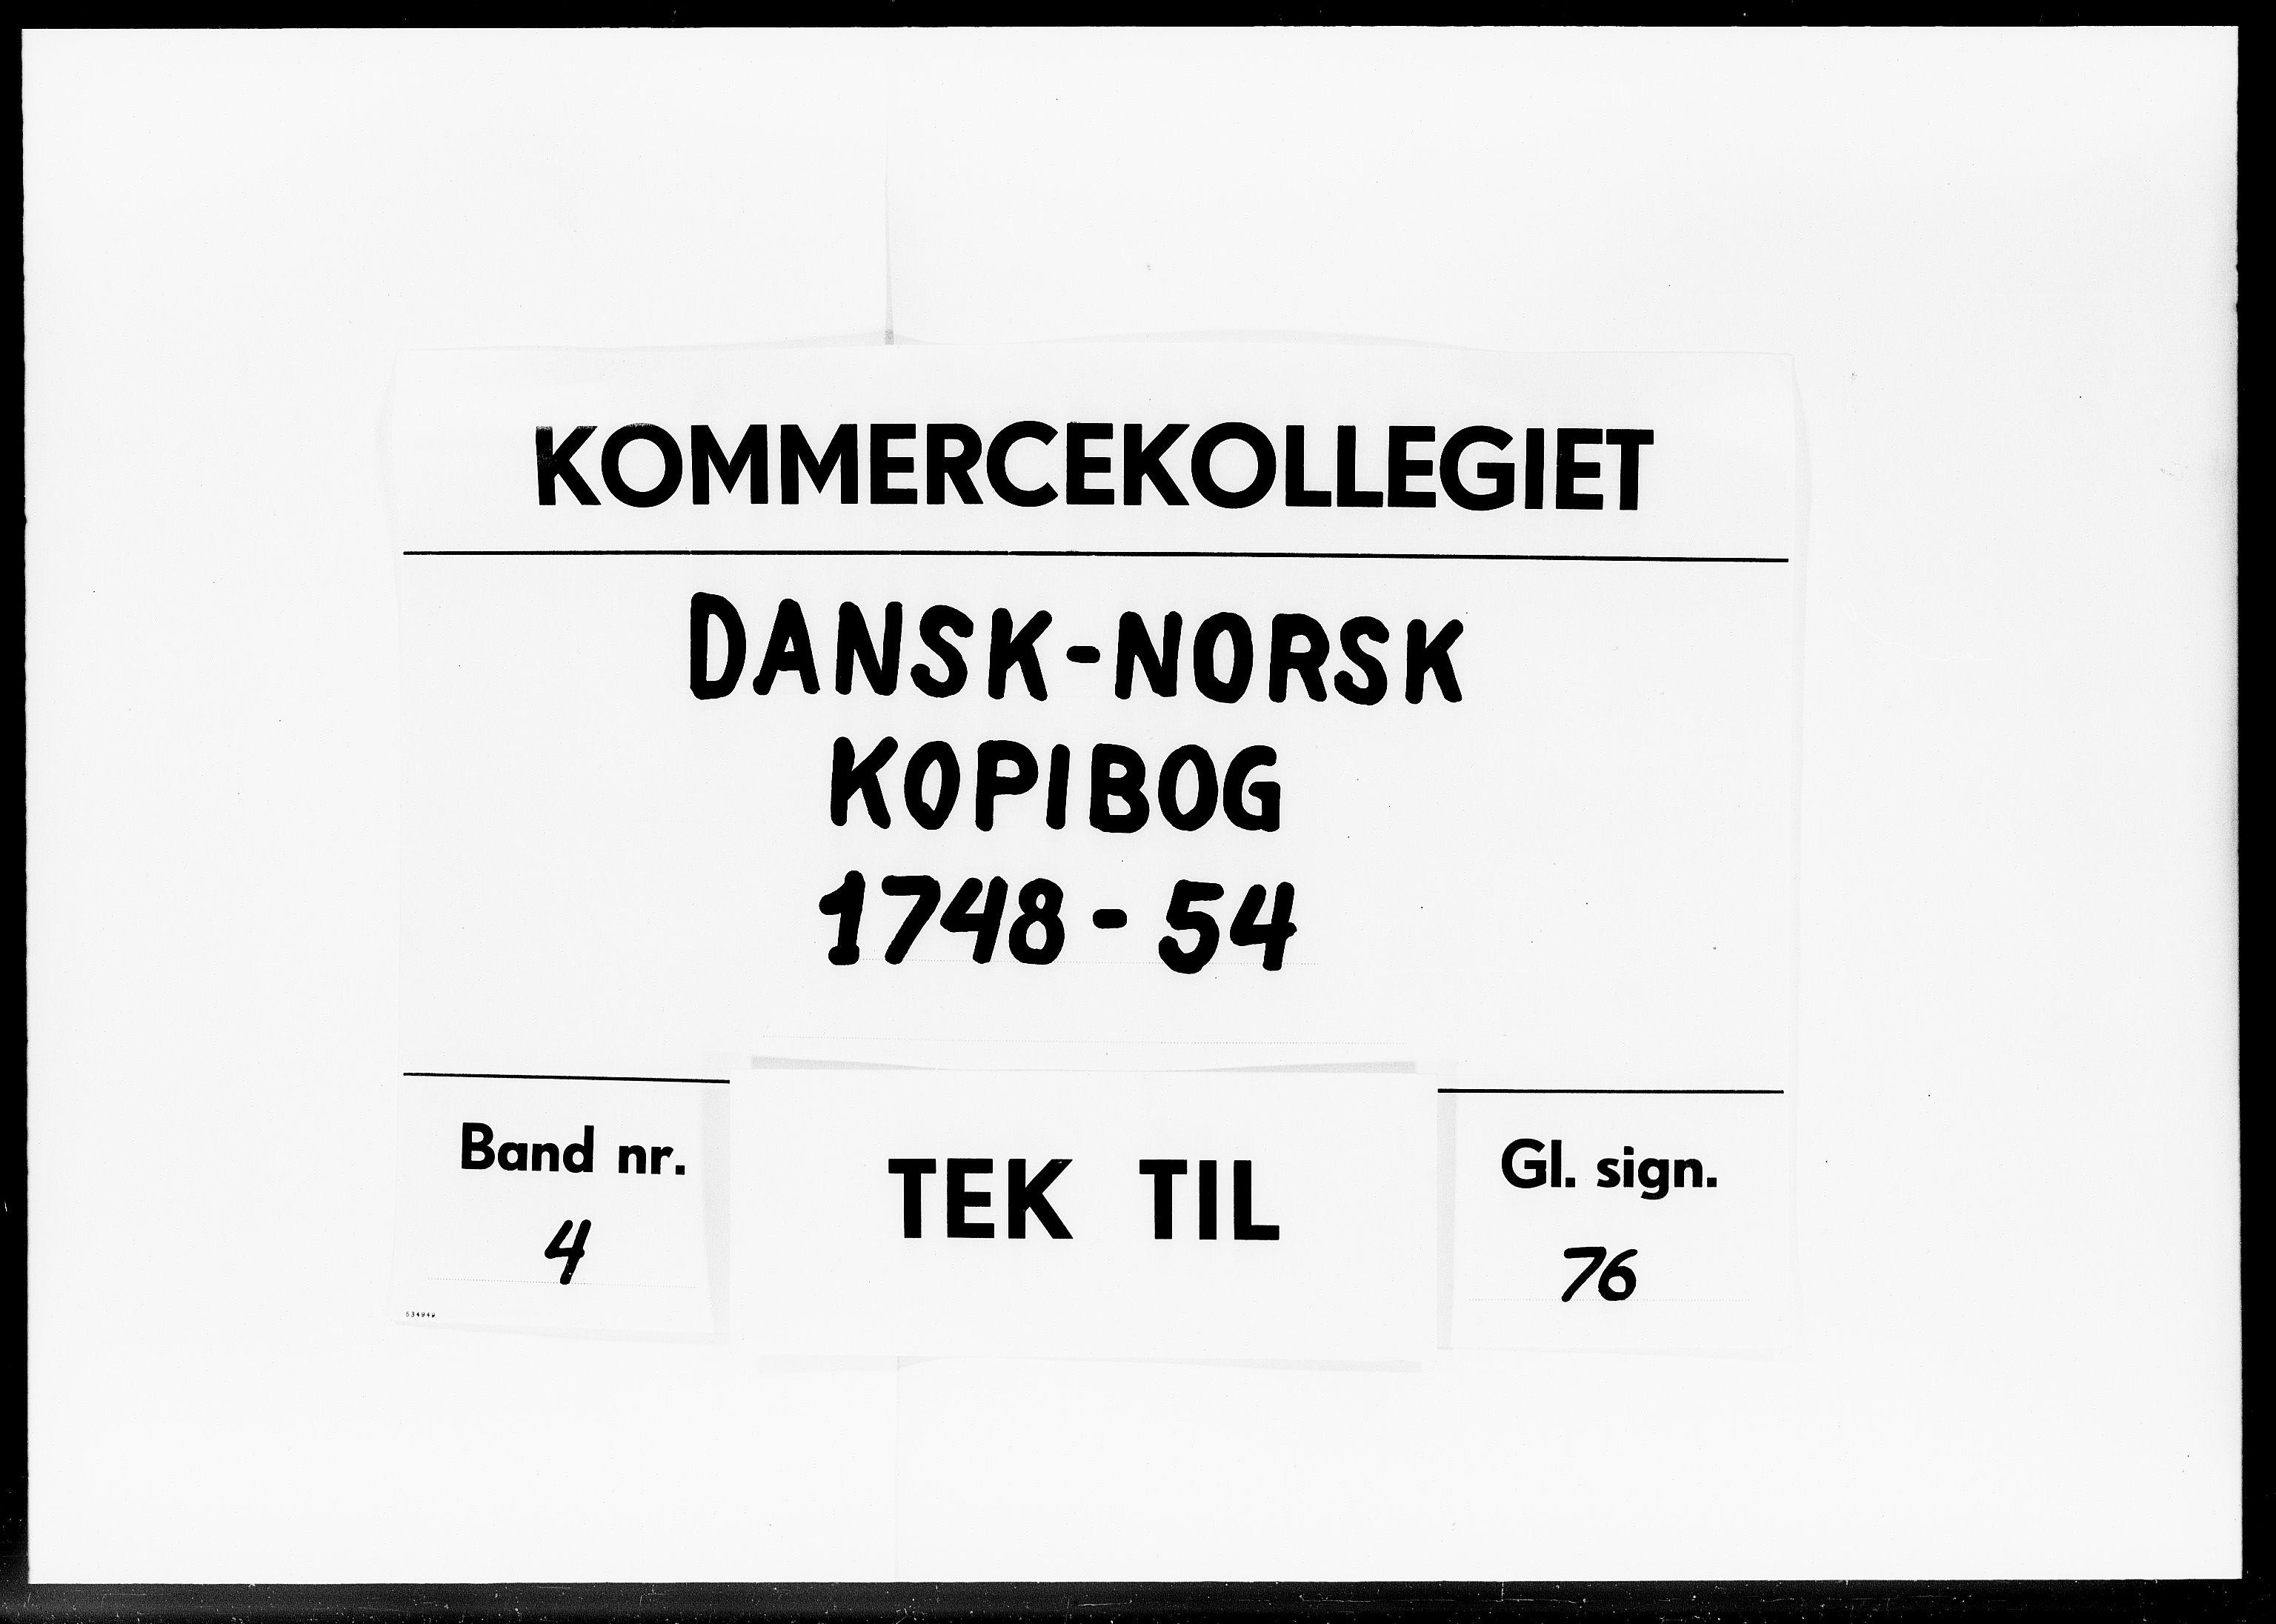 DRA, Kommercekollegiet, Dansk-Norske Sekretariat, -/44: Dansk-Norsk kopibog, 1748-1754